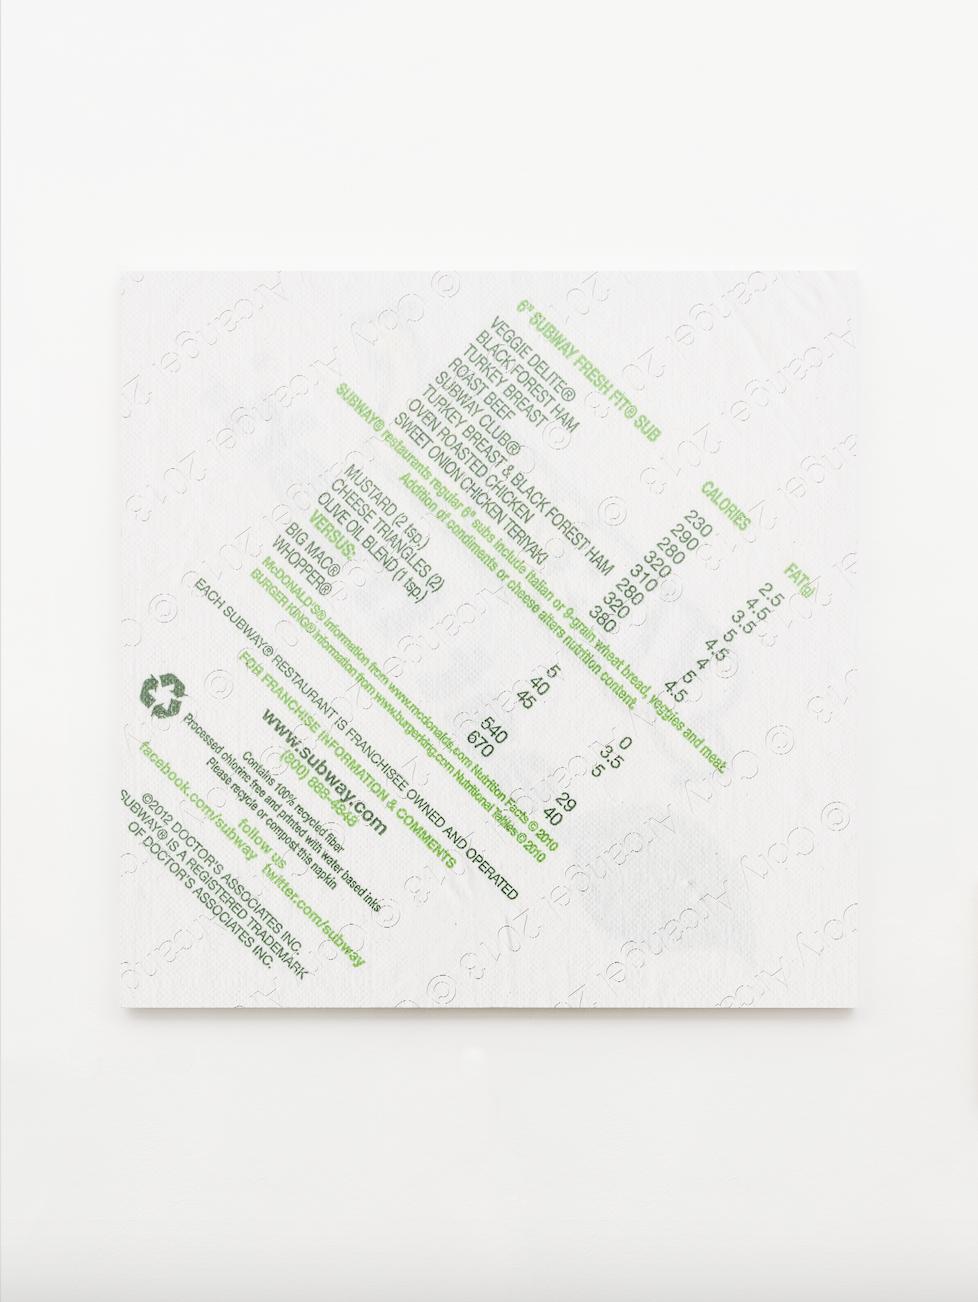 IN REAL LIFE curated by_Luca Lo Pinto, CORY ARCANGEL, Napkin, 2013, Inkjet Print auf Leinwand, 142,2 x 142,2 x 2,5 cm, Photo: Christine König Galerie, Vienna, 2014, Courtesy: Cory Arcangel und Christine König Galerie